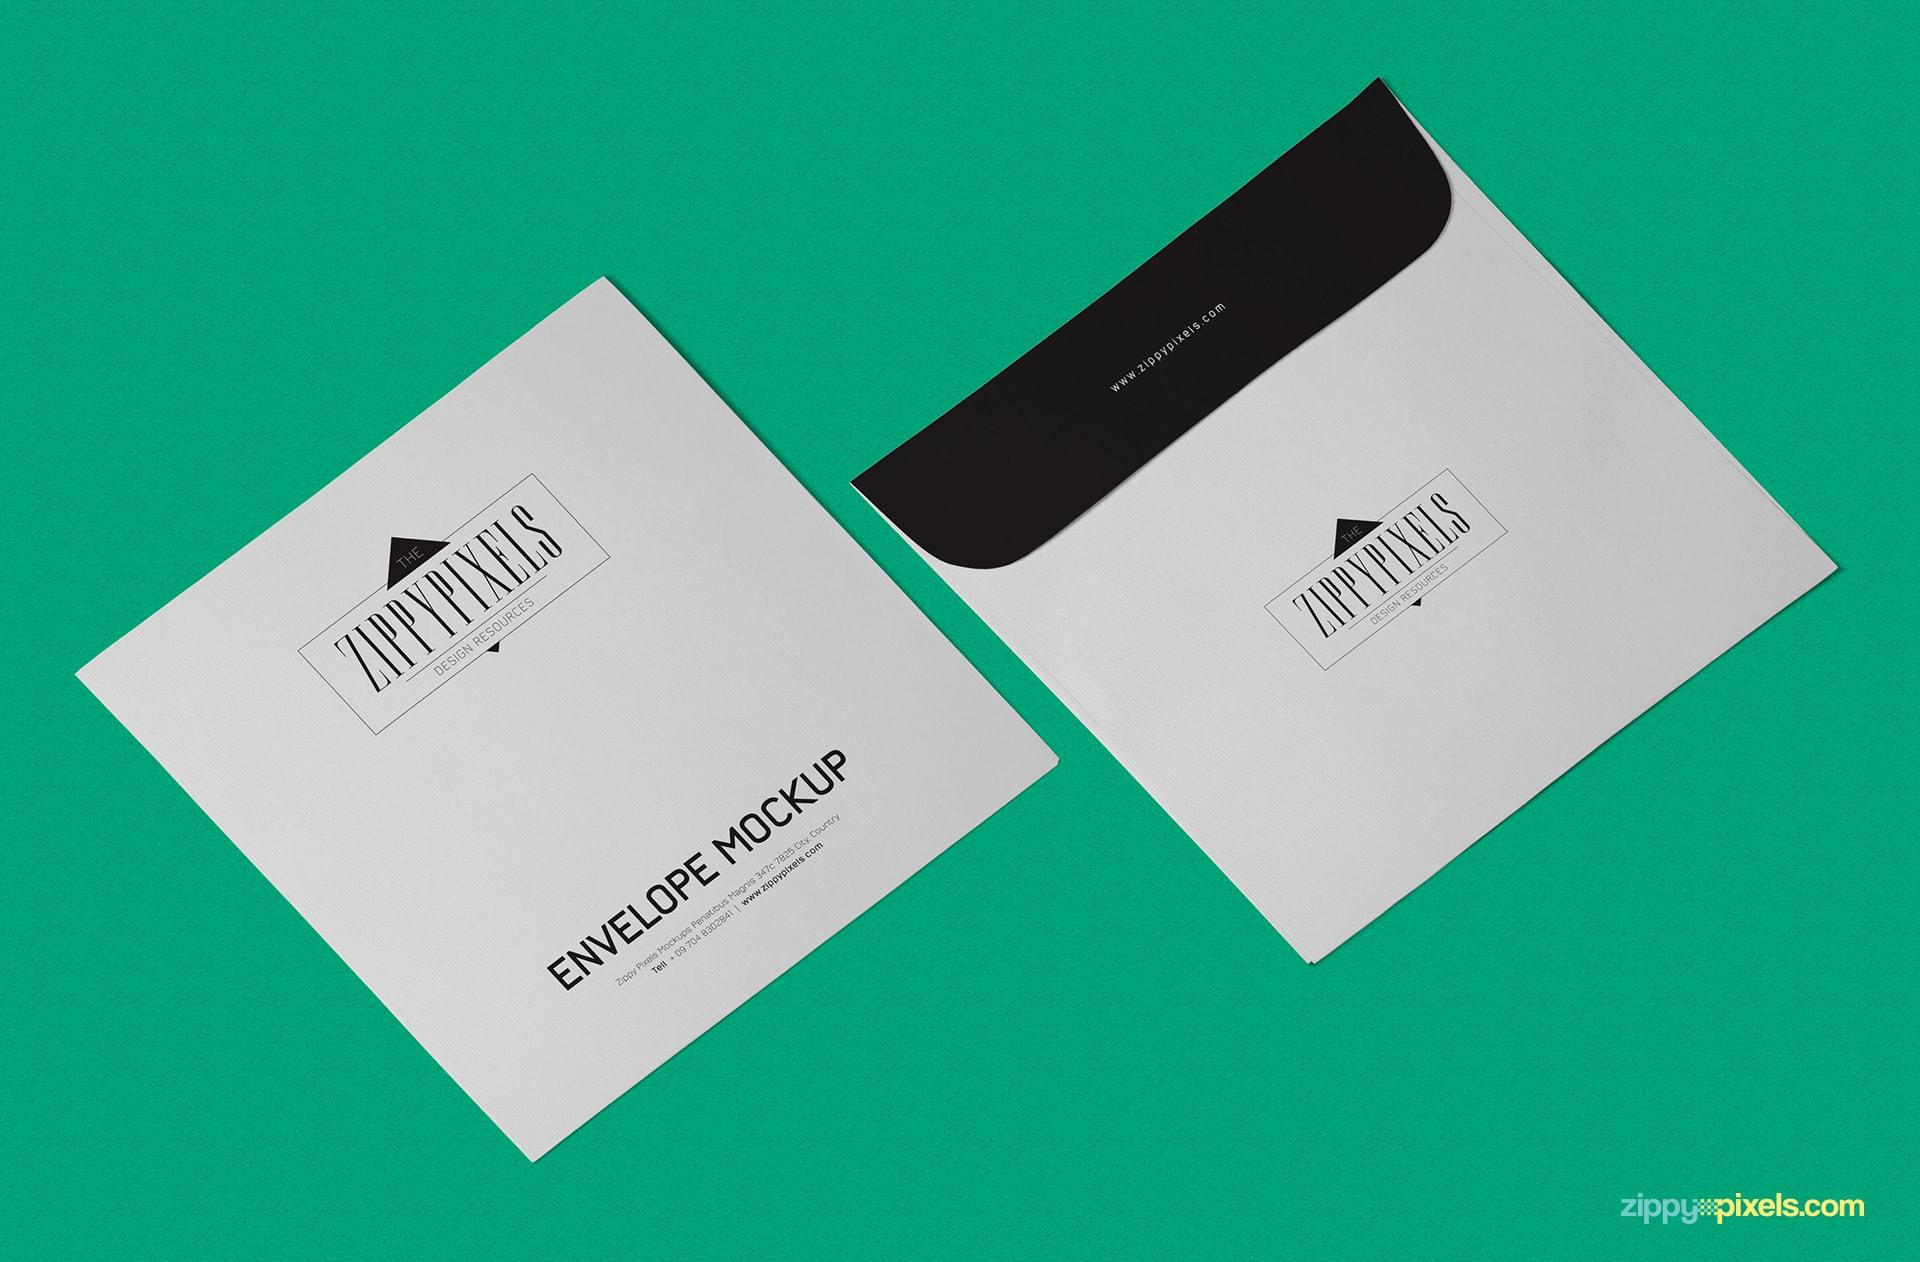 25 best envelope psd mockup templates decolorenet for Envelope psd